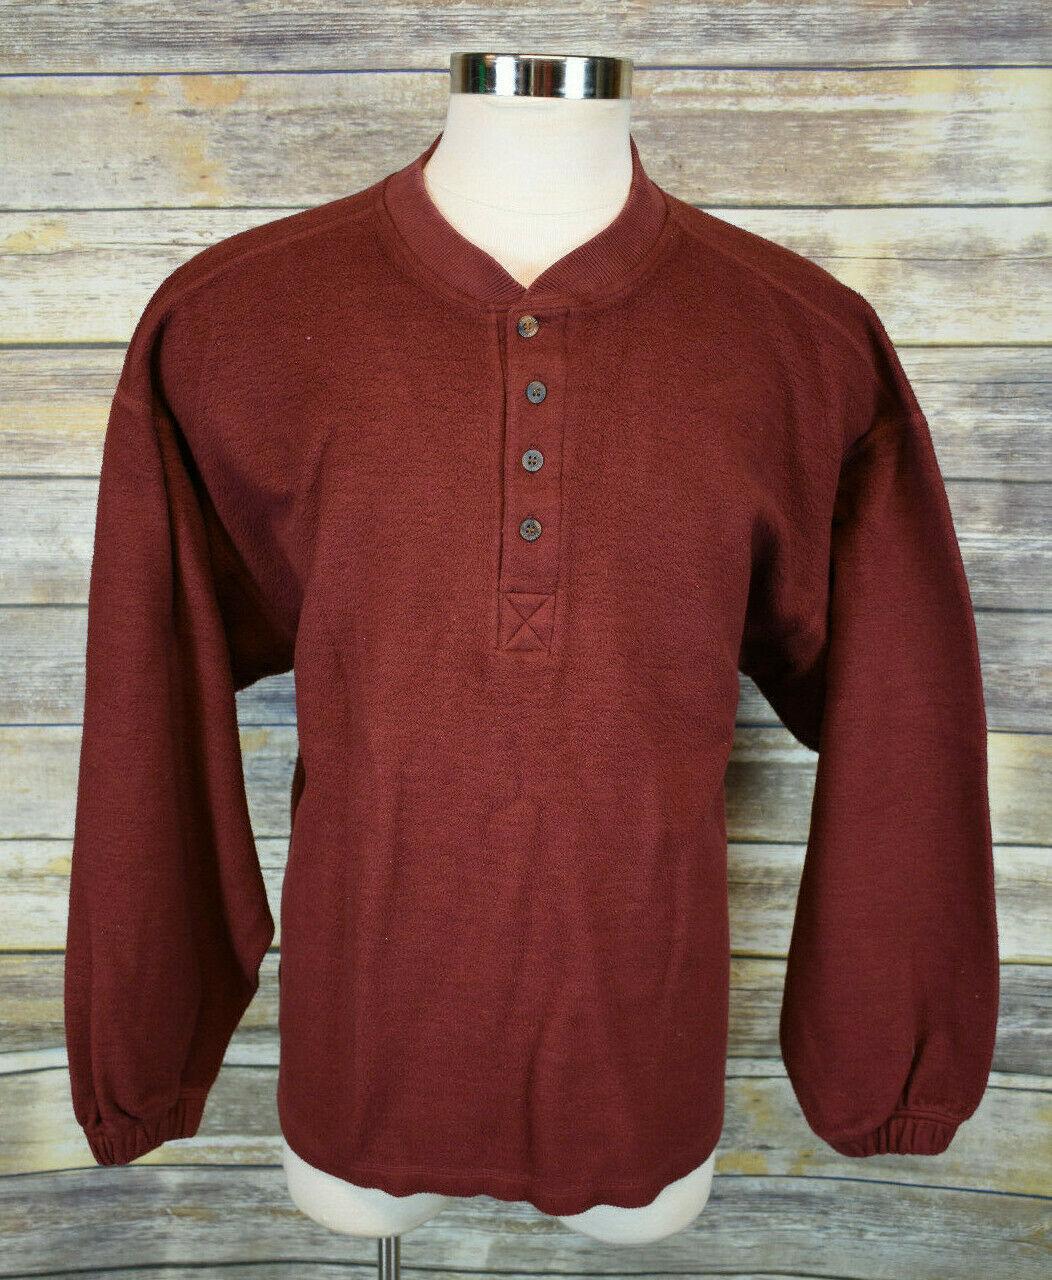 Mens Jansport Burgundy Sweatshirt Sweater 1/2 Button Cotton Blend XL - $18.81